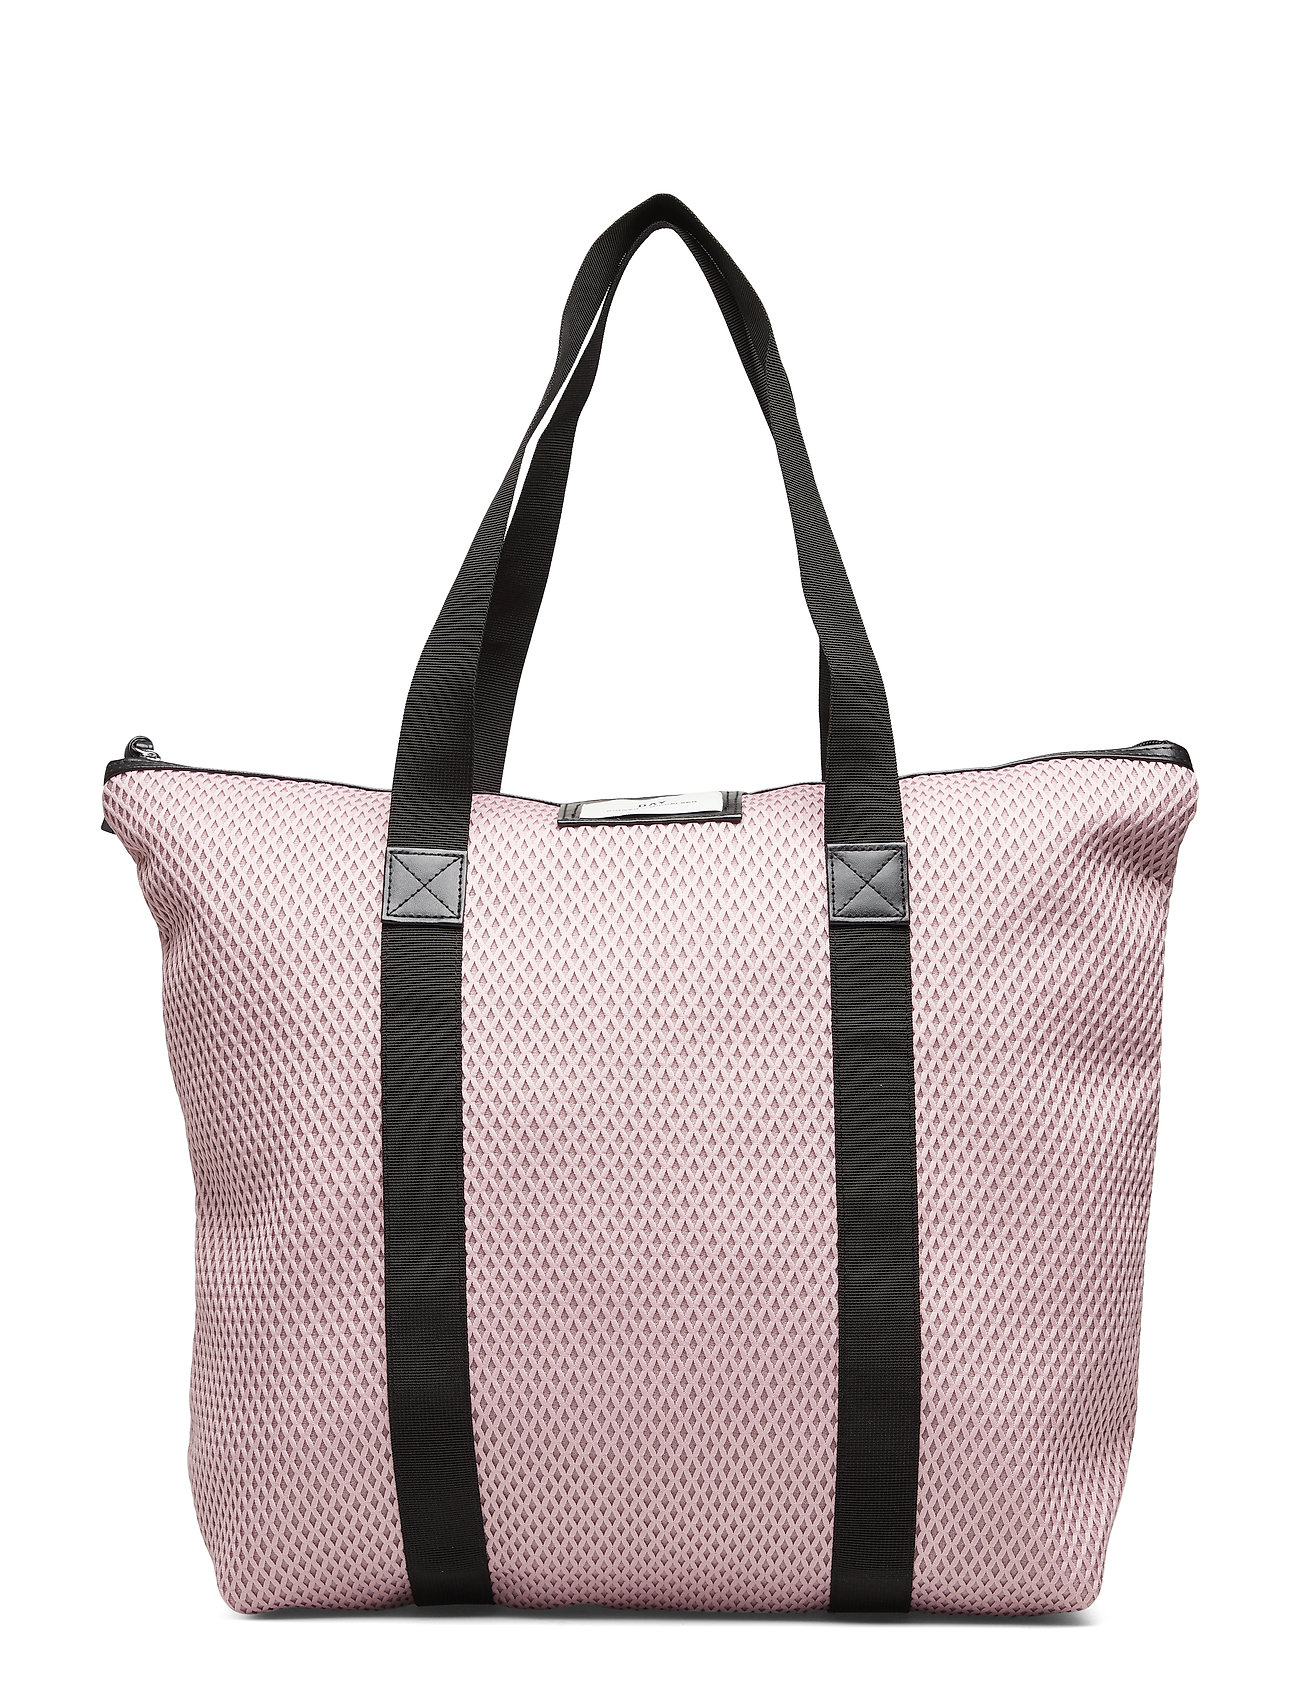 DAY et Day Gweneth Netting Bag